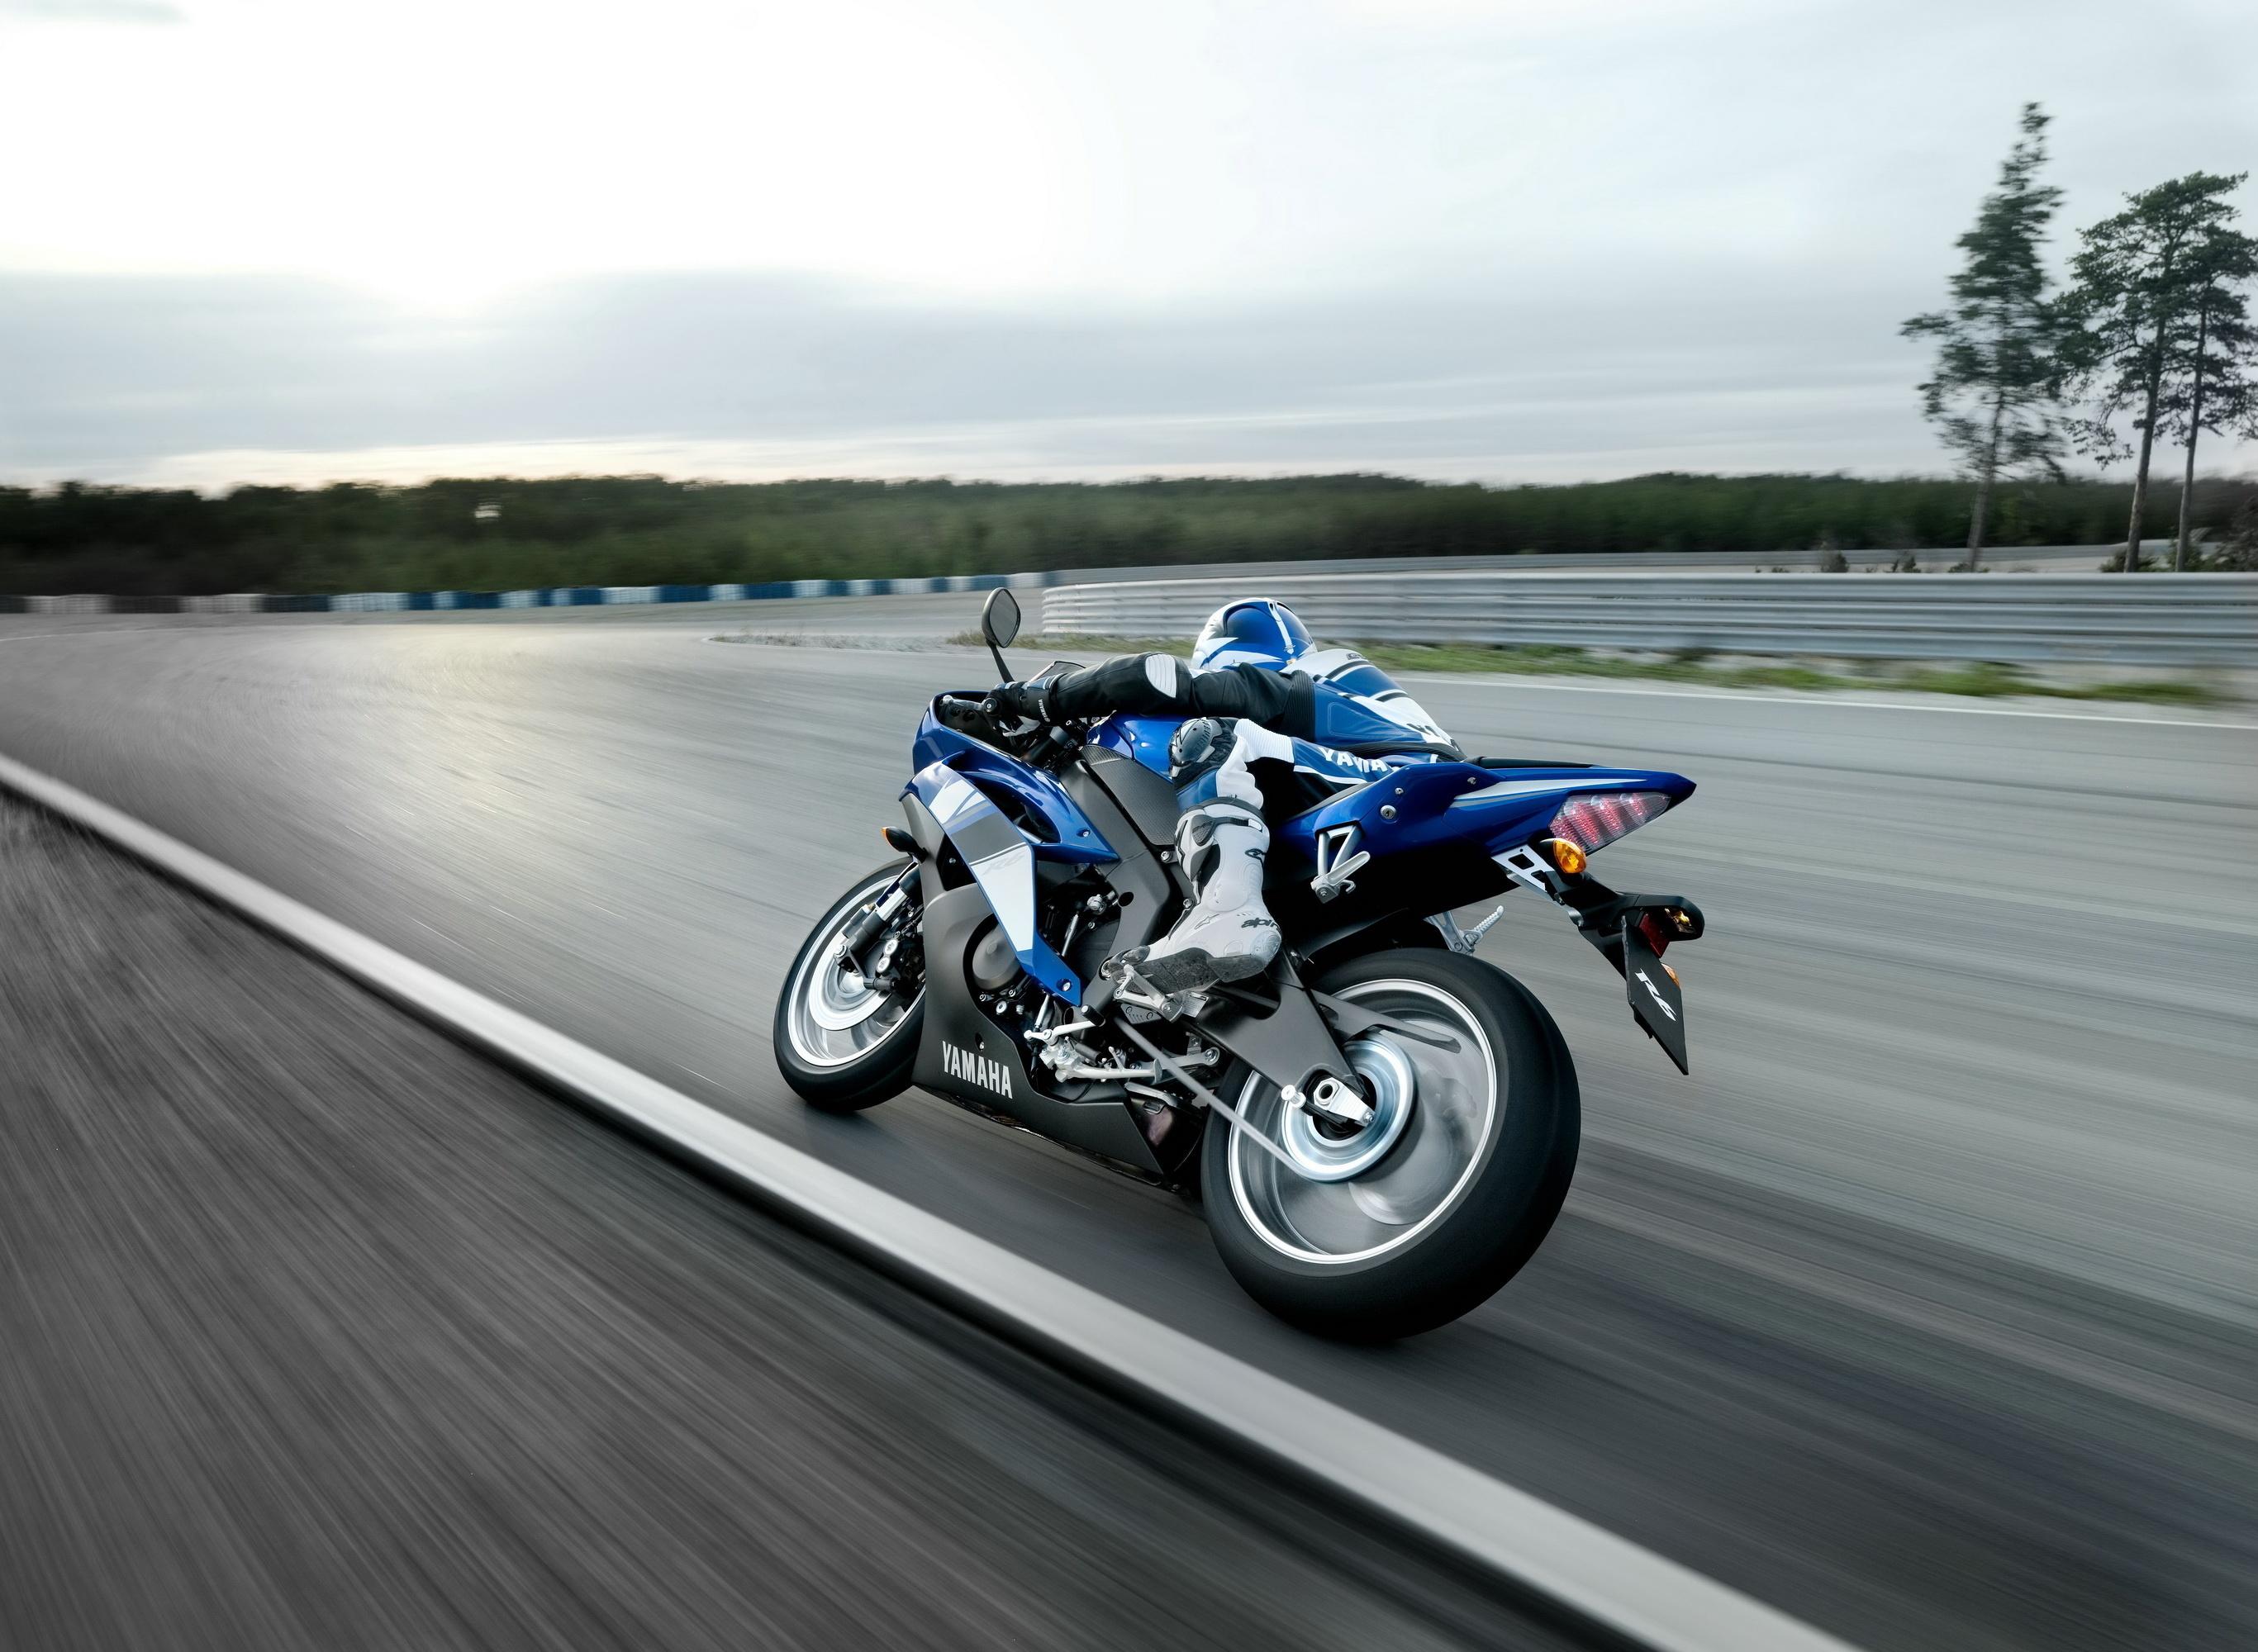 WallpapersWide.com | Motorcycle Racing HD Desktop Wallpapers for ...